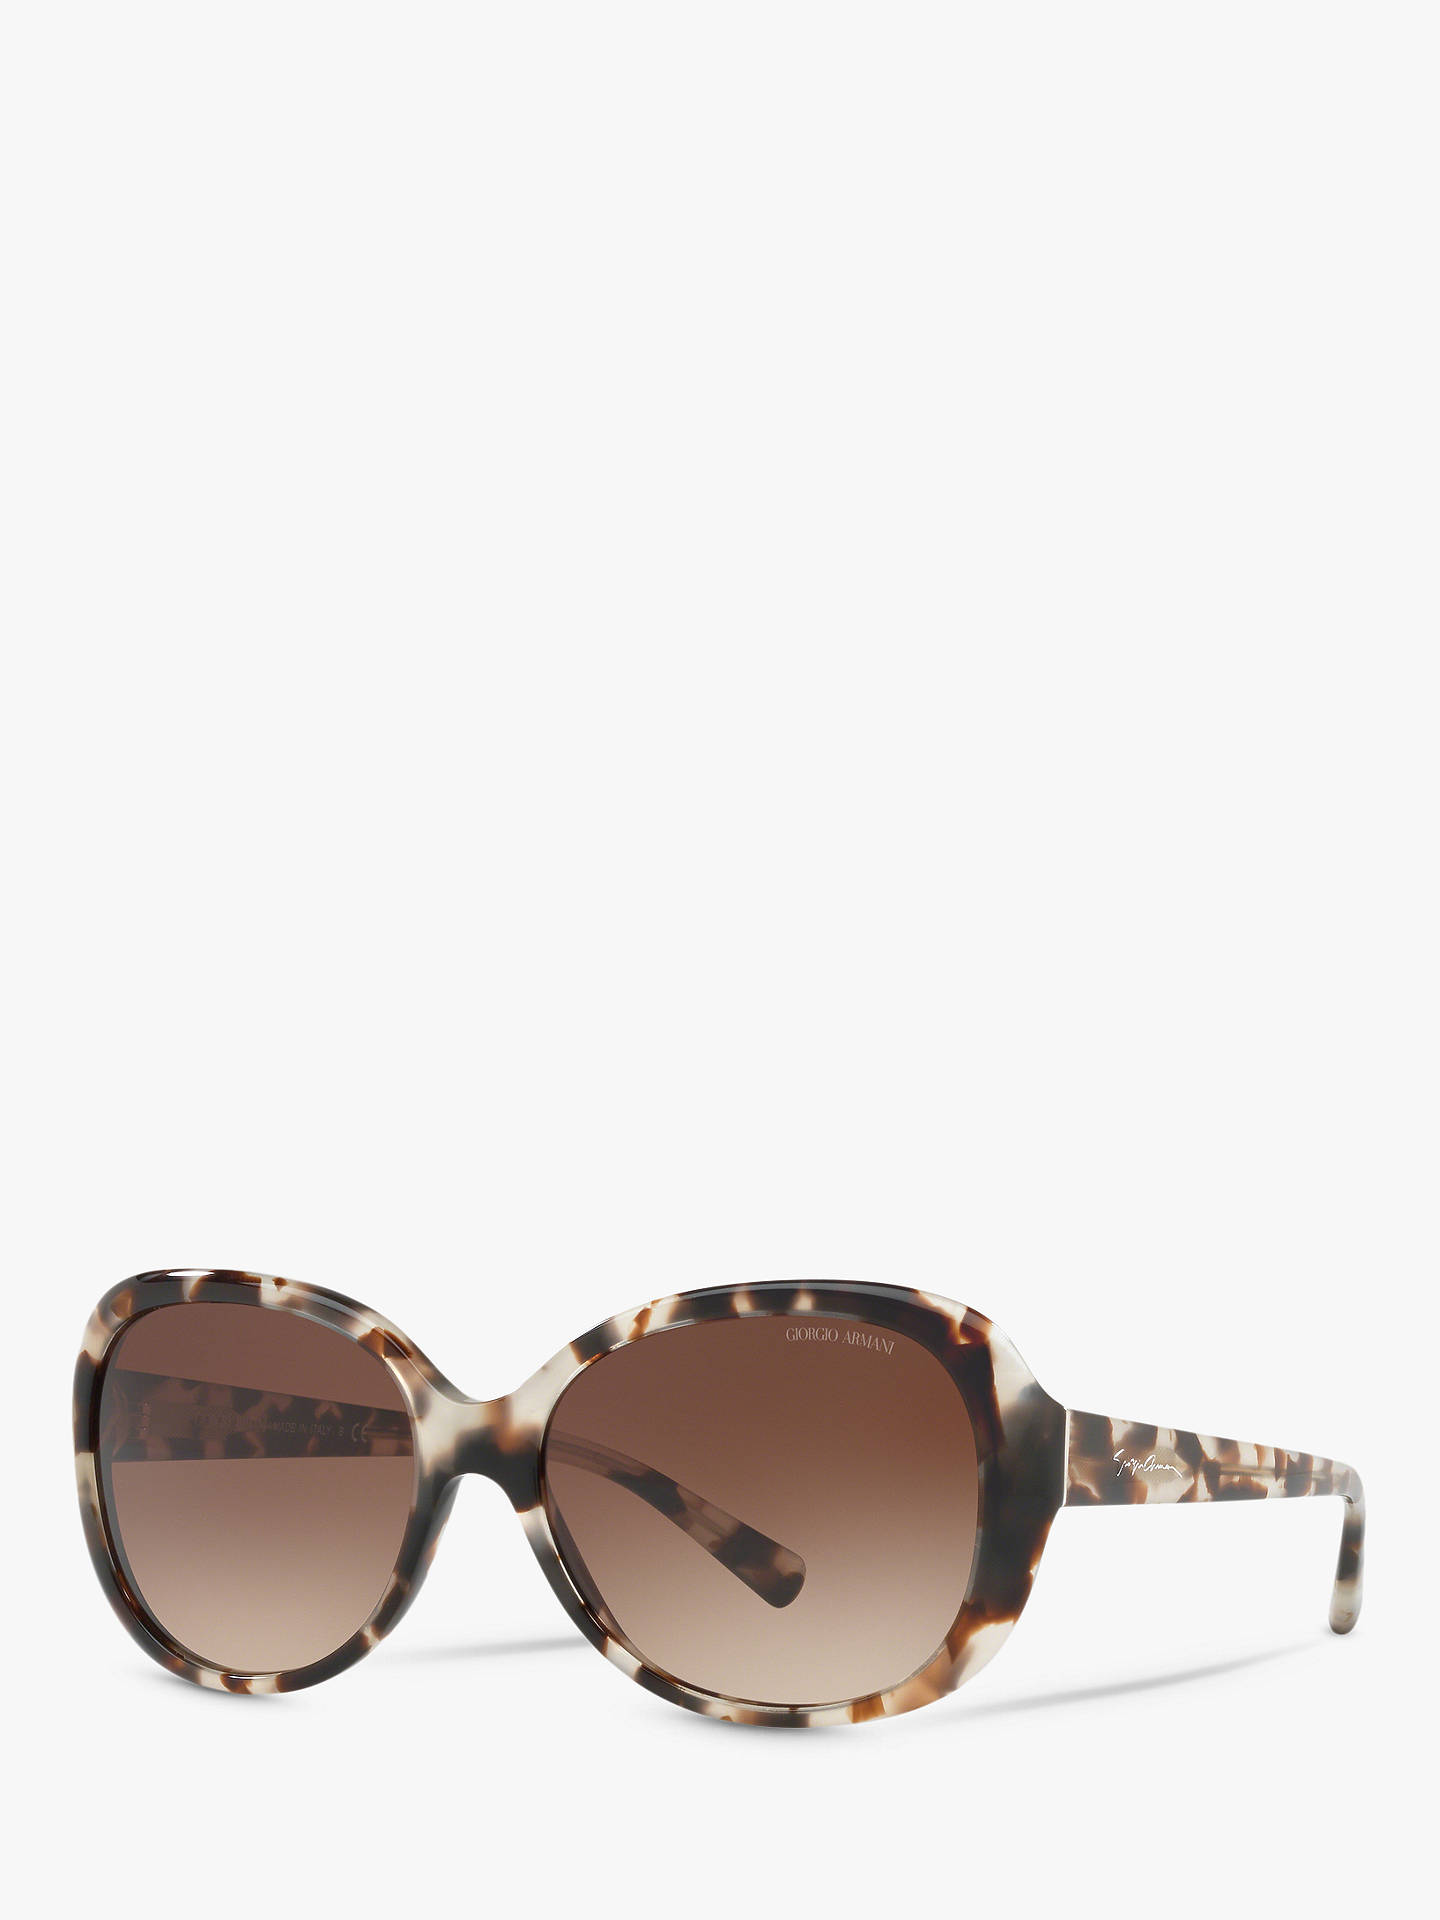 a85260016 Buy Giorgio Armani AR8047 Women's Round Sunglasses, Beige Havana/Brown  Gradient Online at johnlewis ...